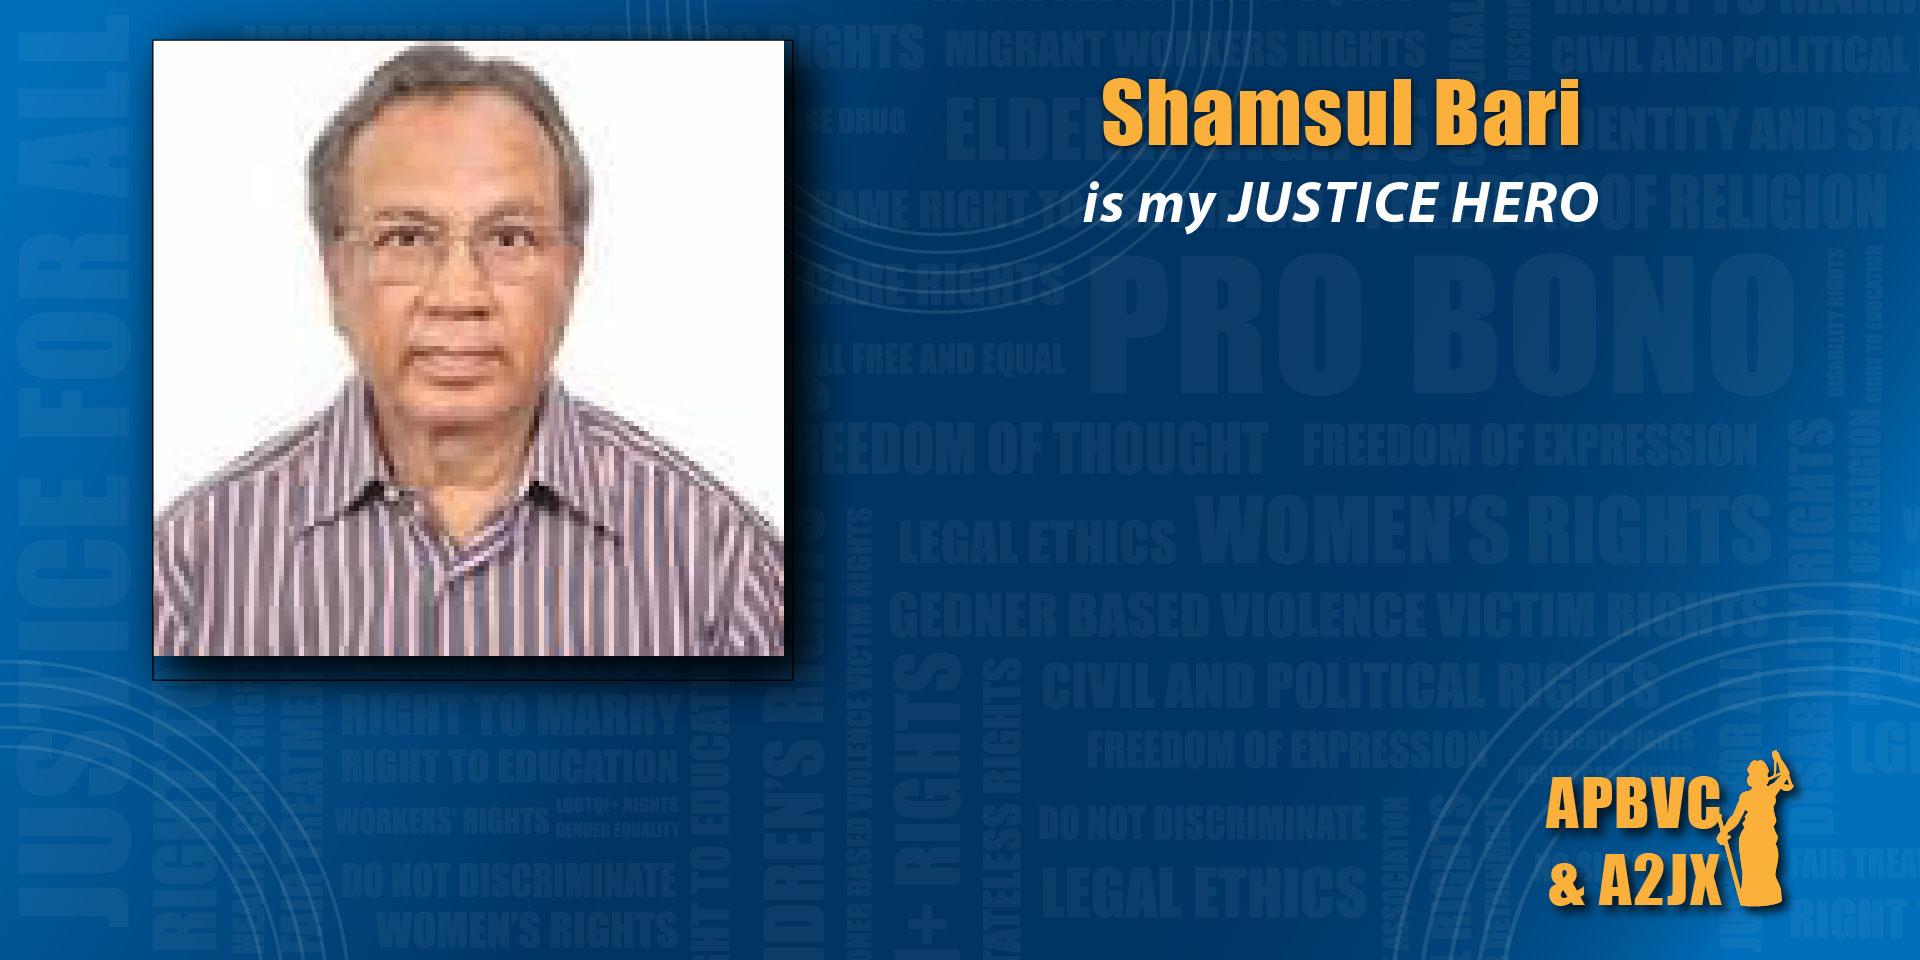 Shamsul Bari